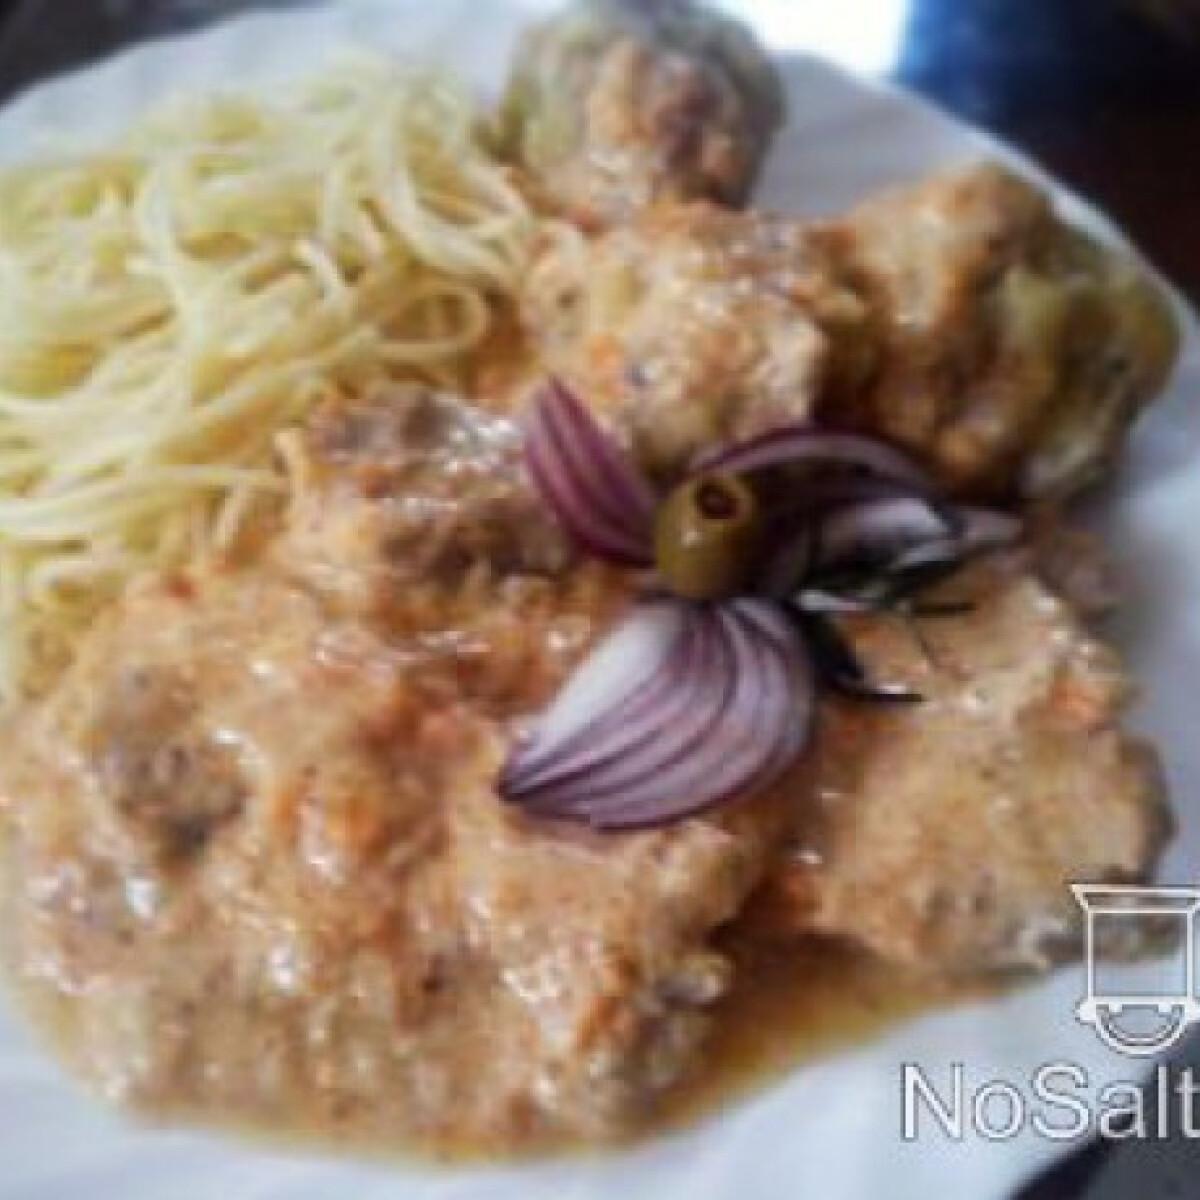 Vadas zsemlegombóccal és spagettival